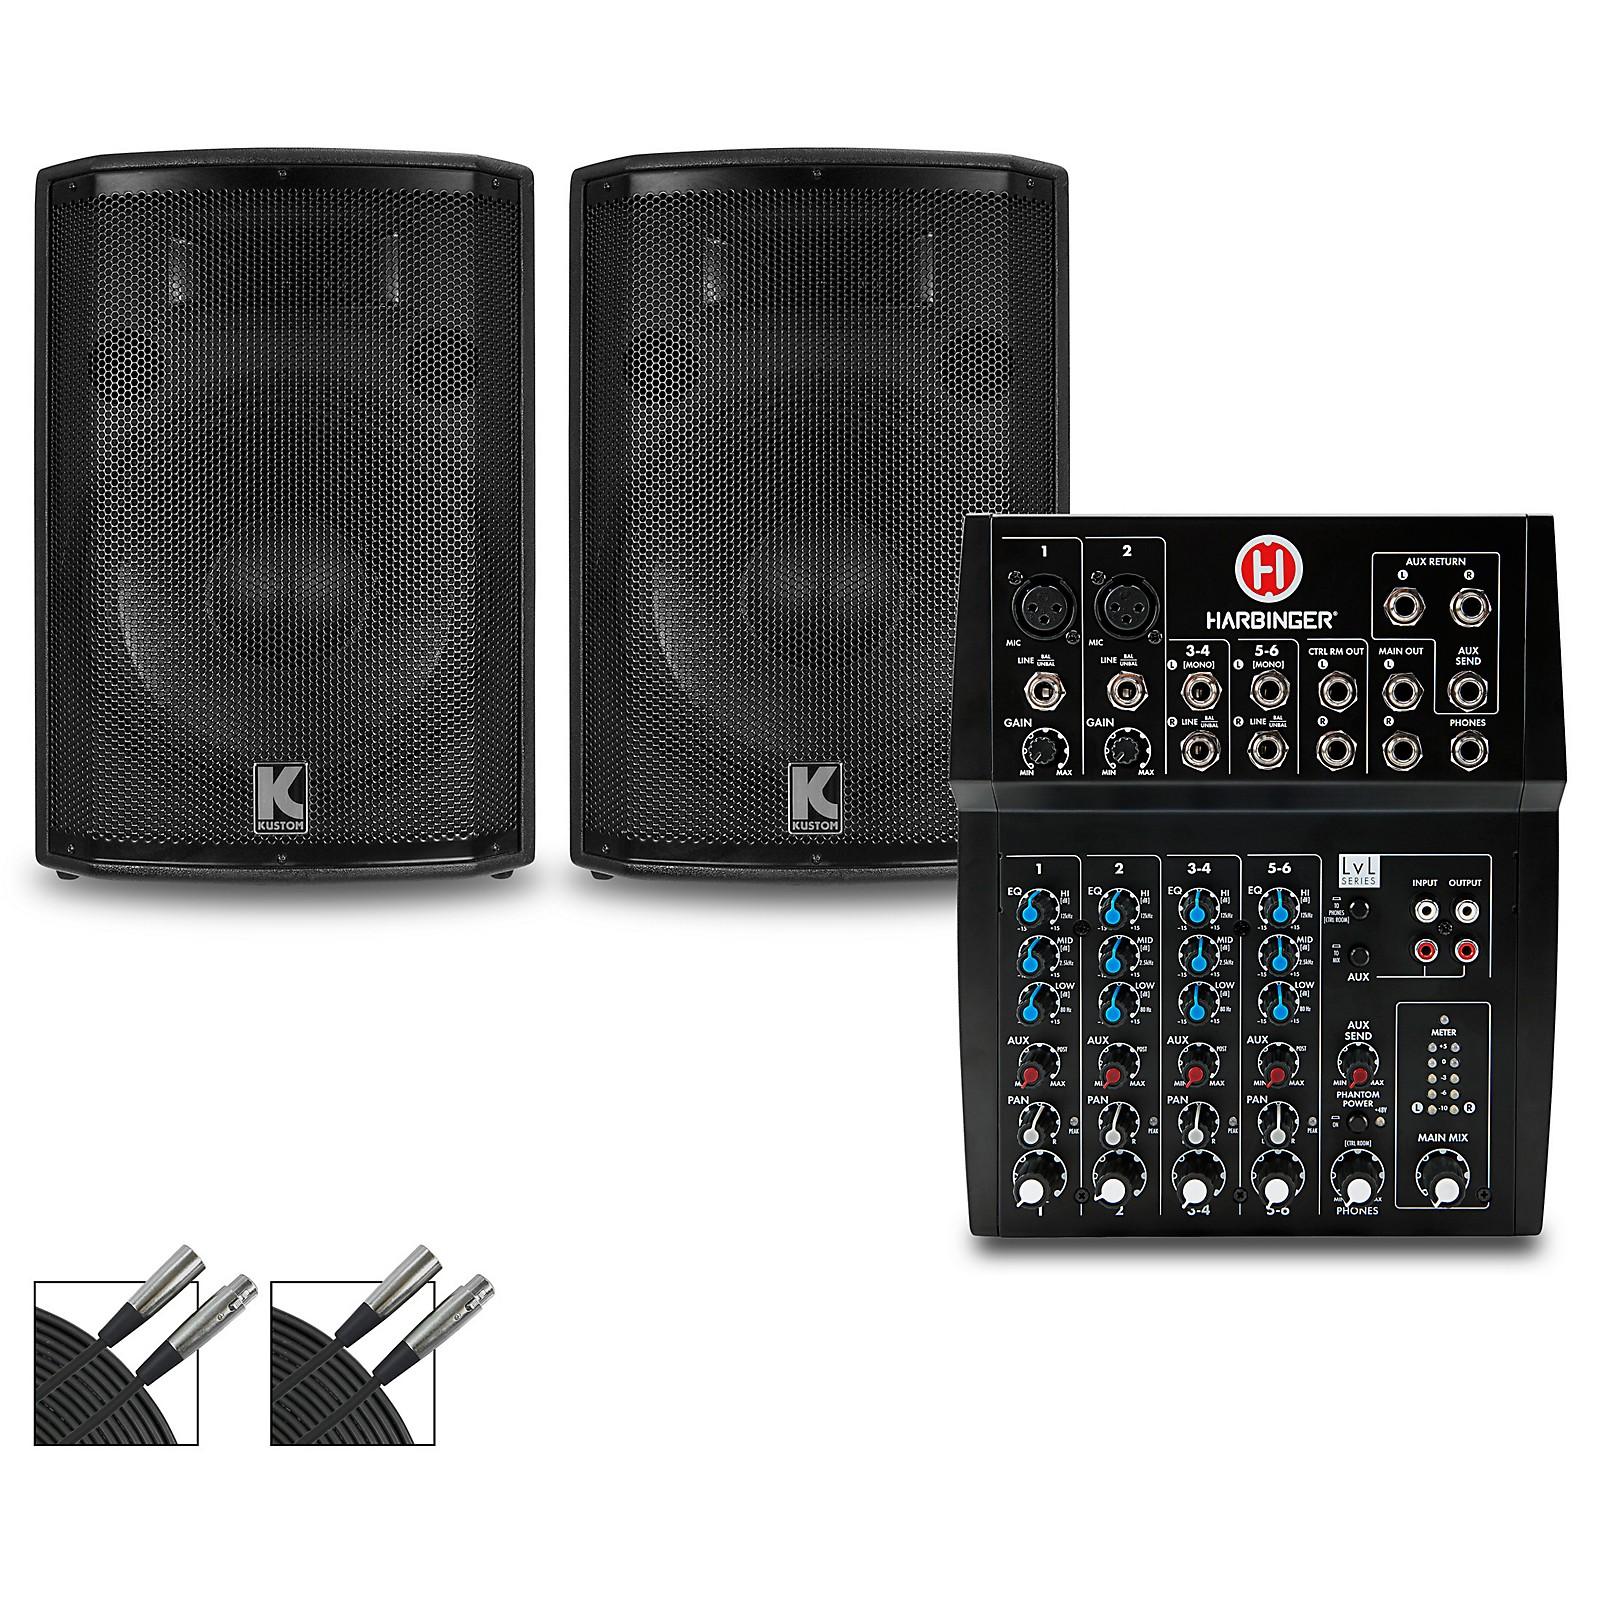 Harbinger L802 Mixer and Kustom HiPAC Speakers